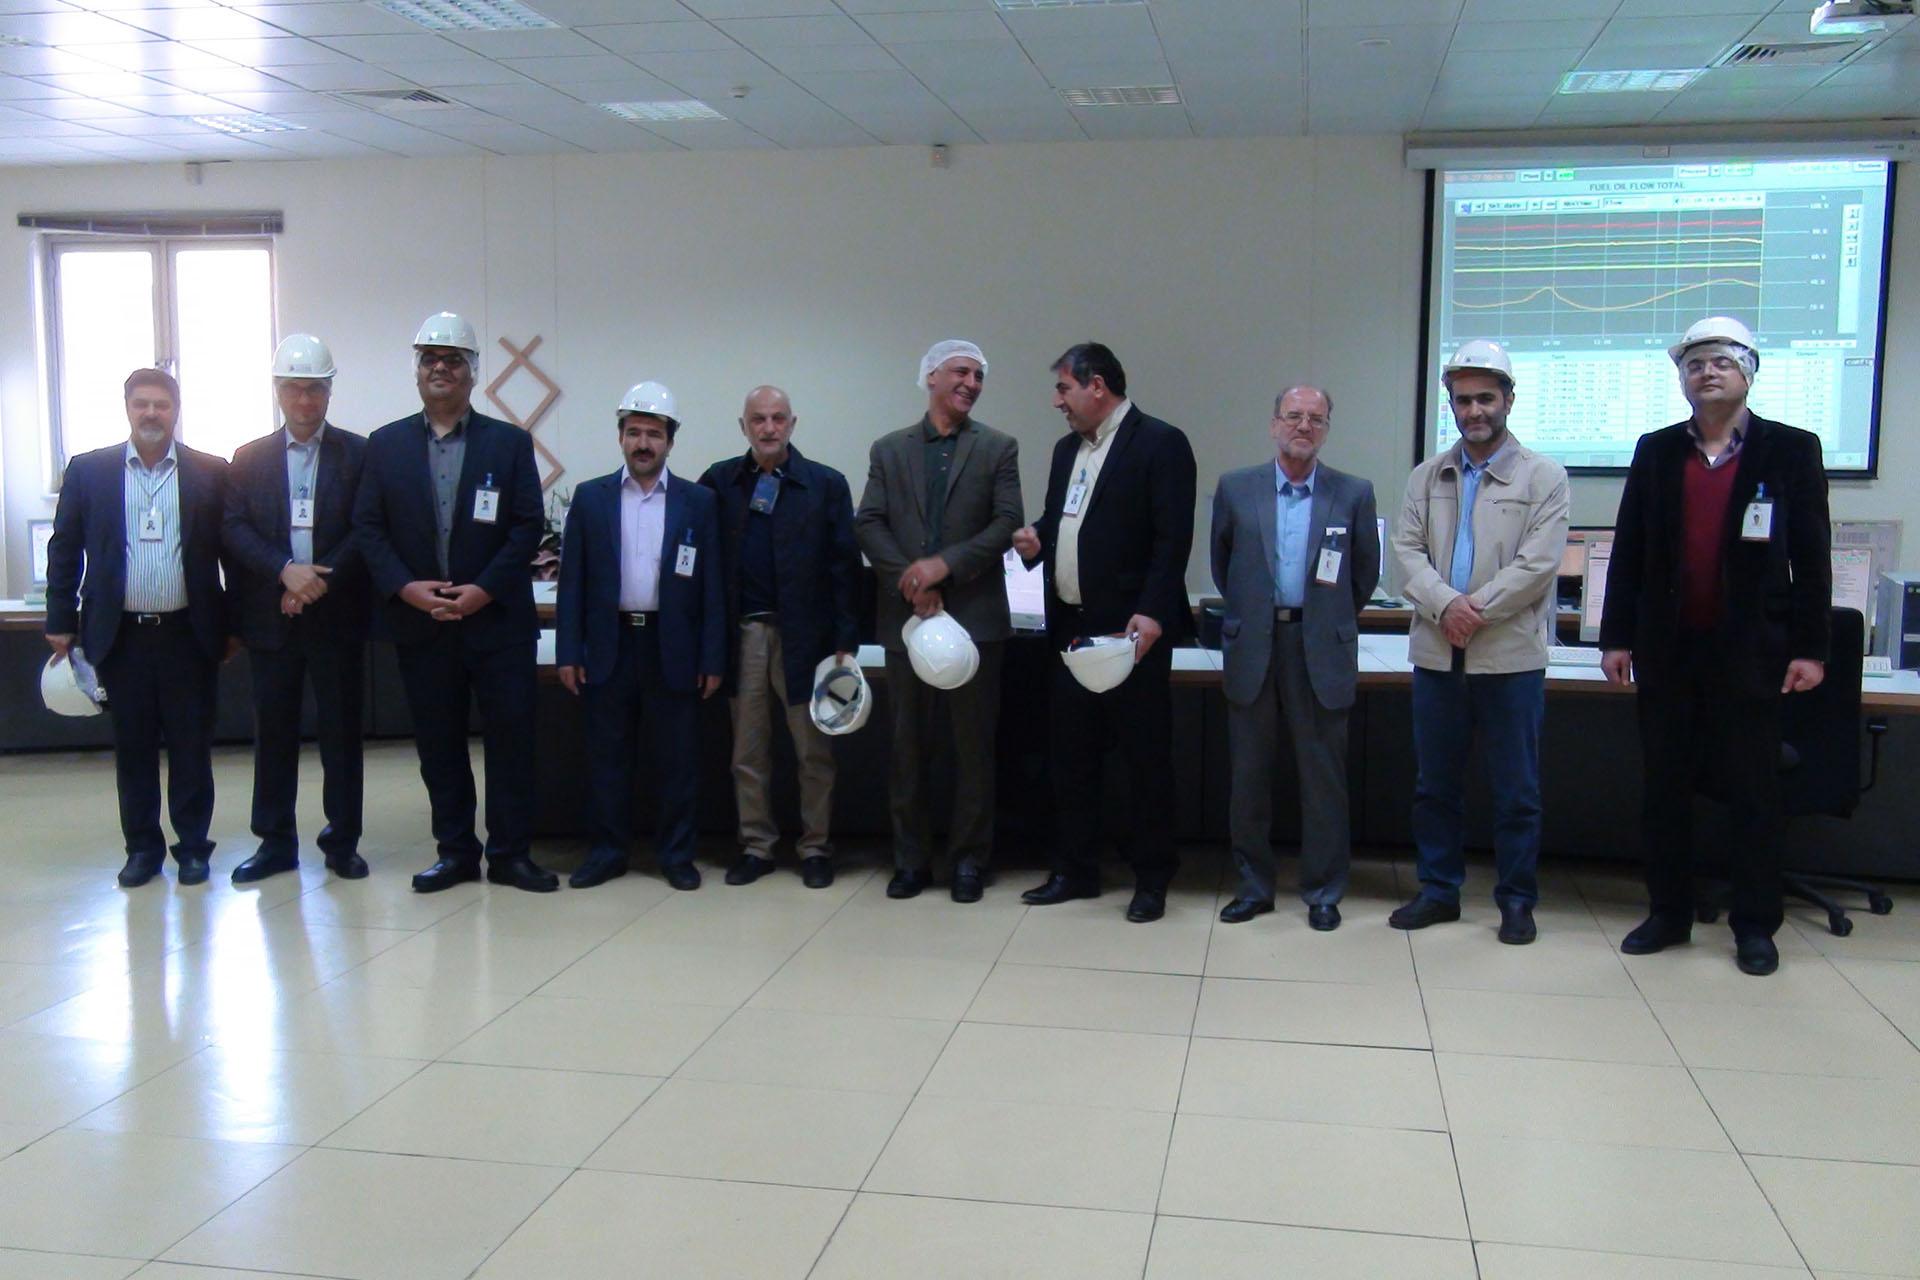 Members of Parliament Visited Rudshur Power Plant